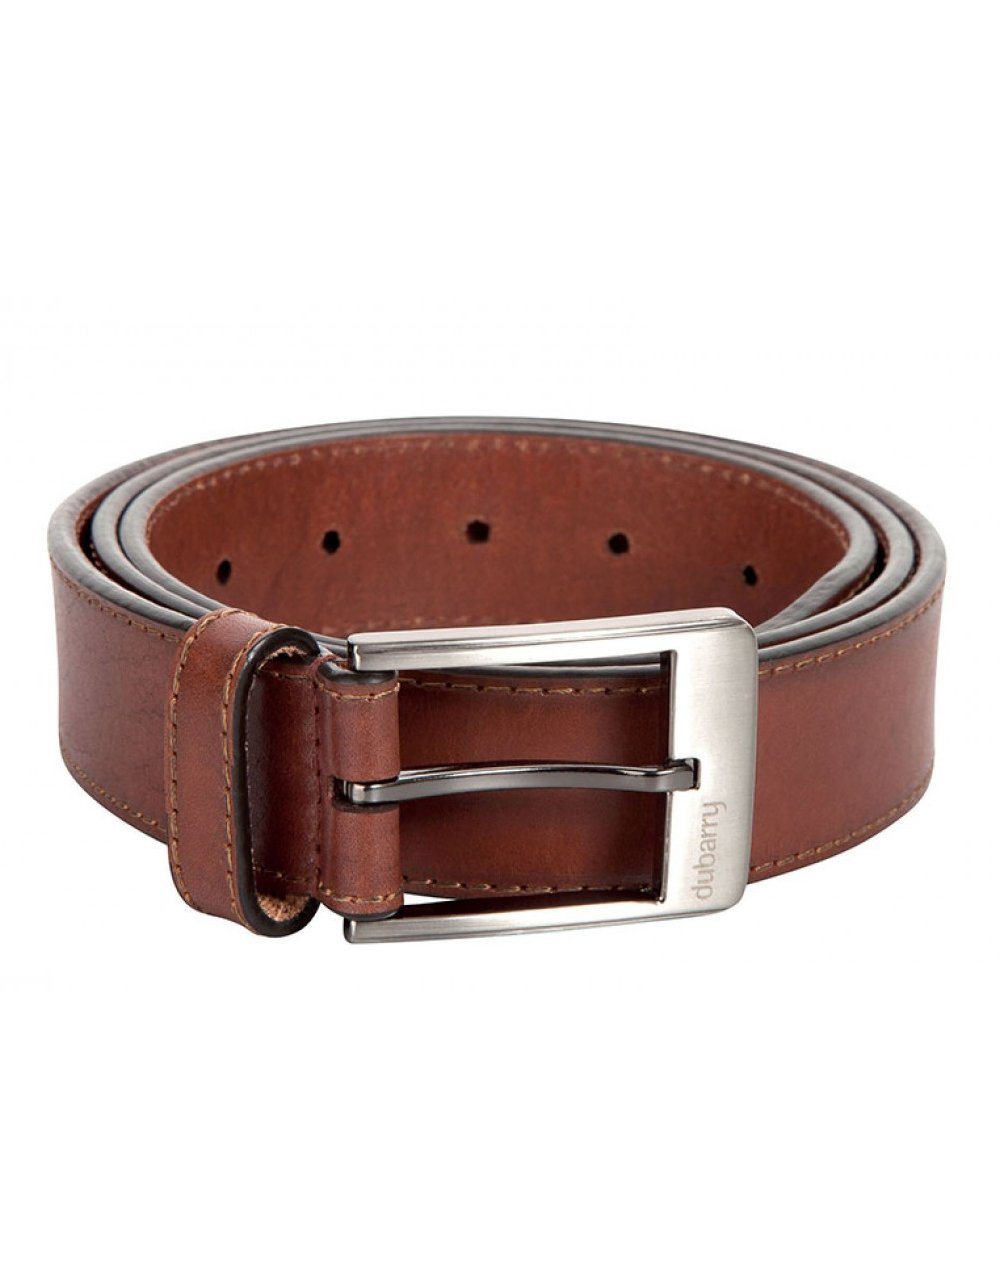 dubarry dubarry leather belt chestnut dubarry from